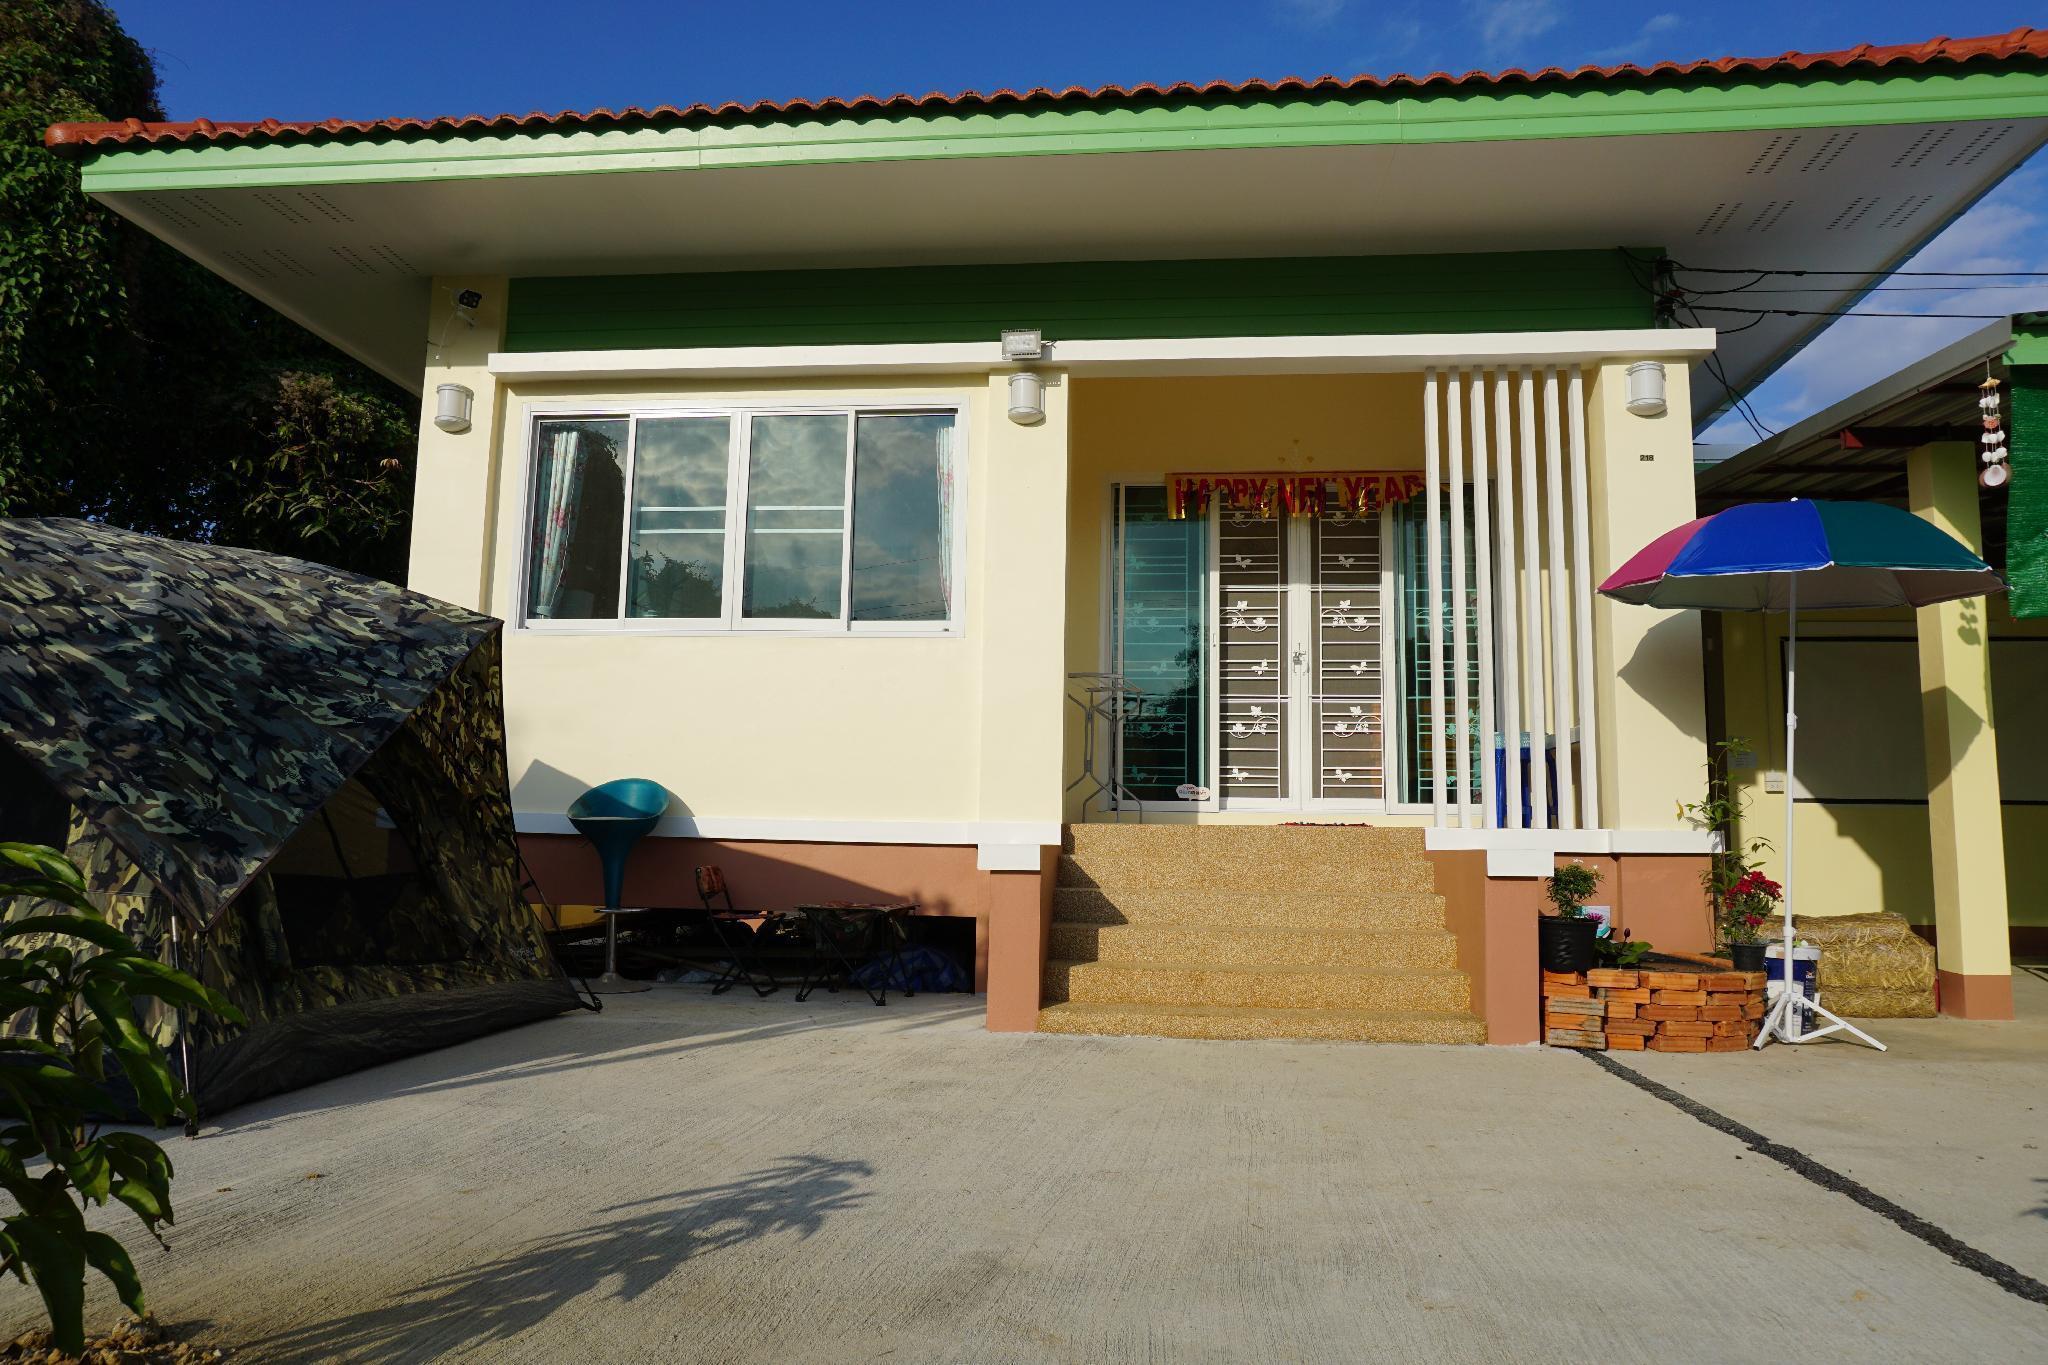 MuanJai Homestay (Price per night for 2-4 person) ม่วนใจ๋โฮมสเตย์